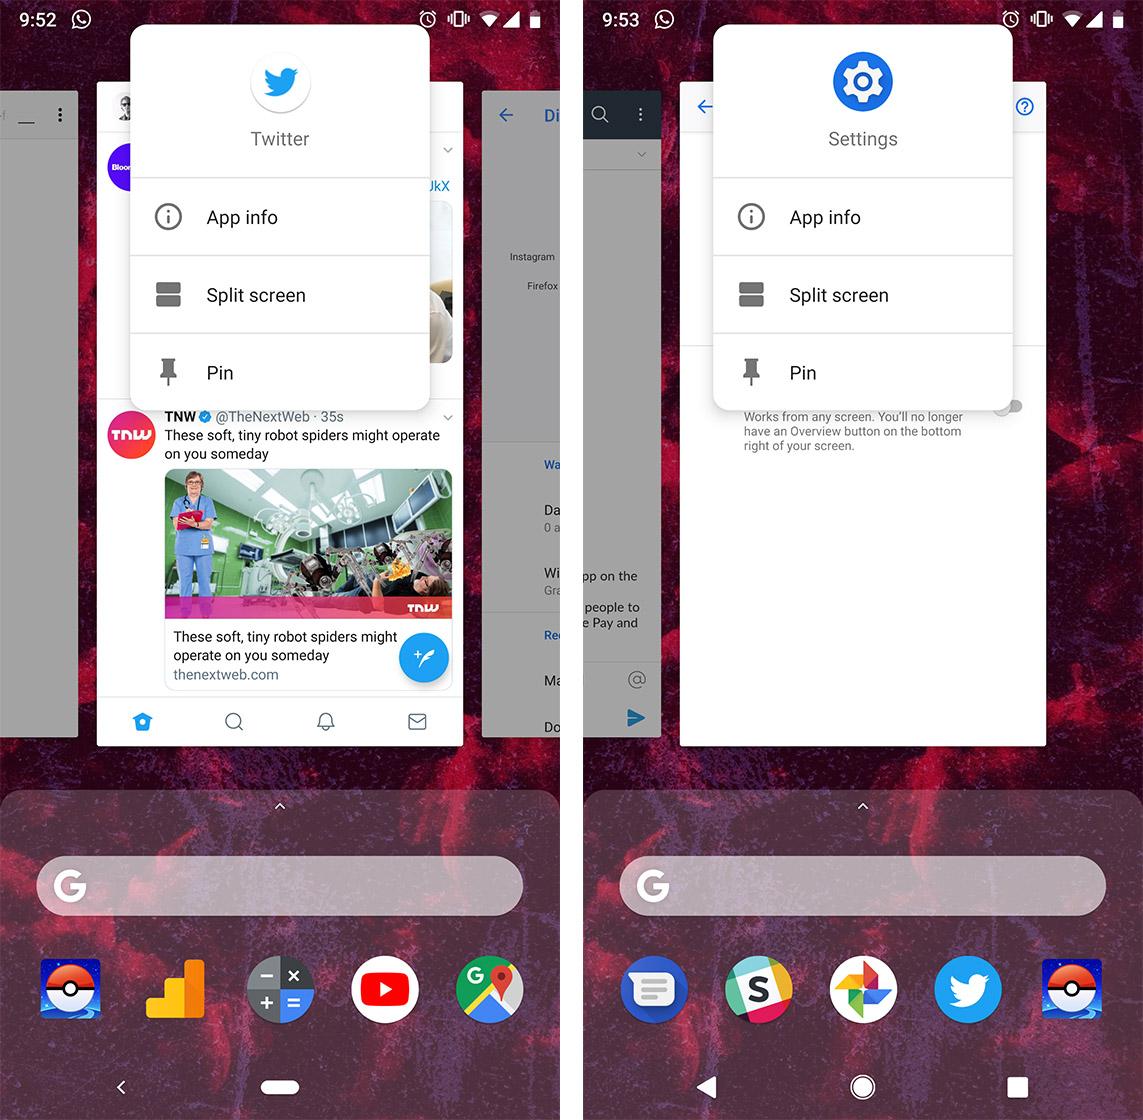 Activating split screen in Android Pie